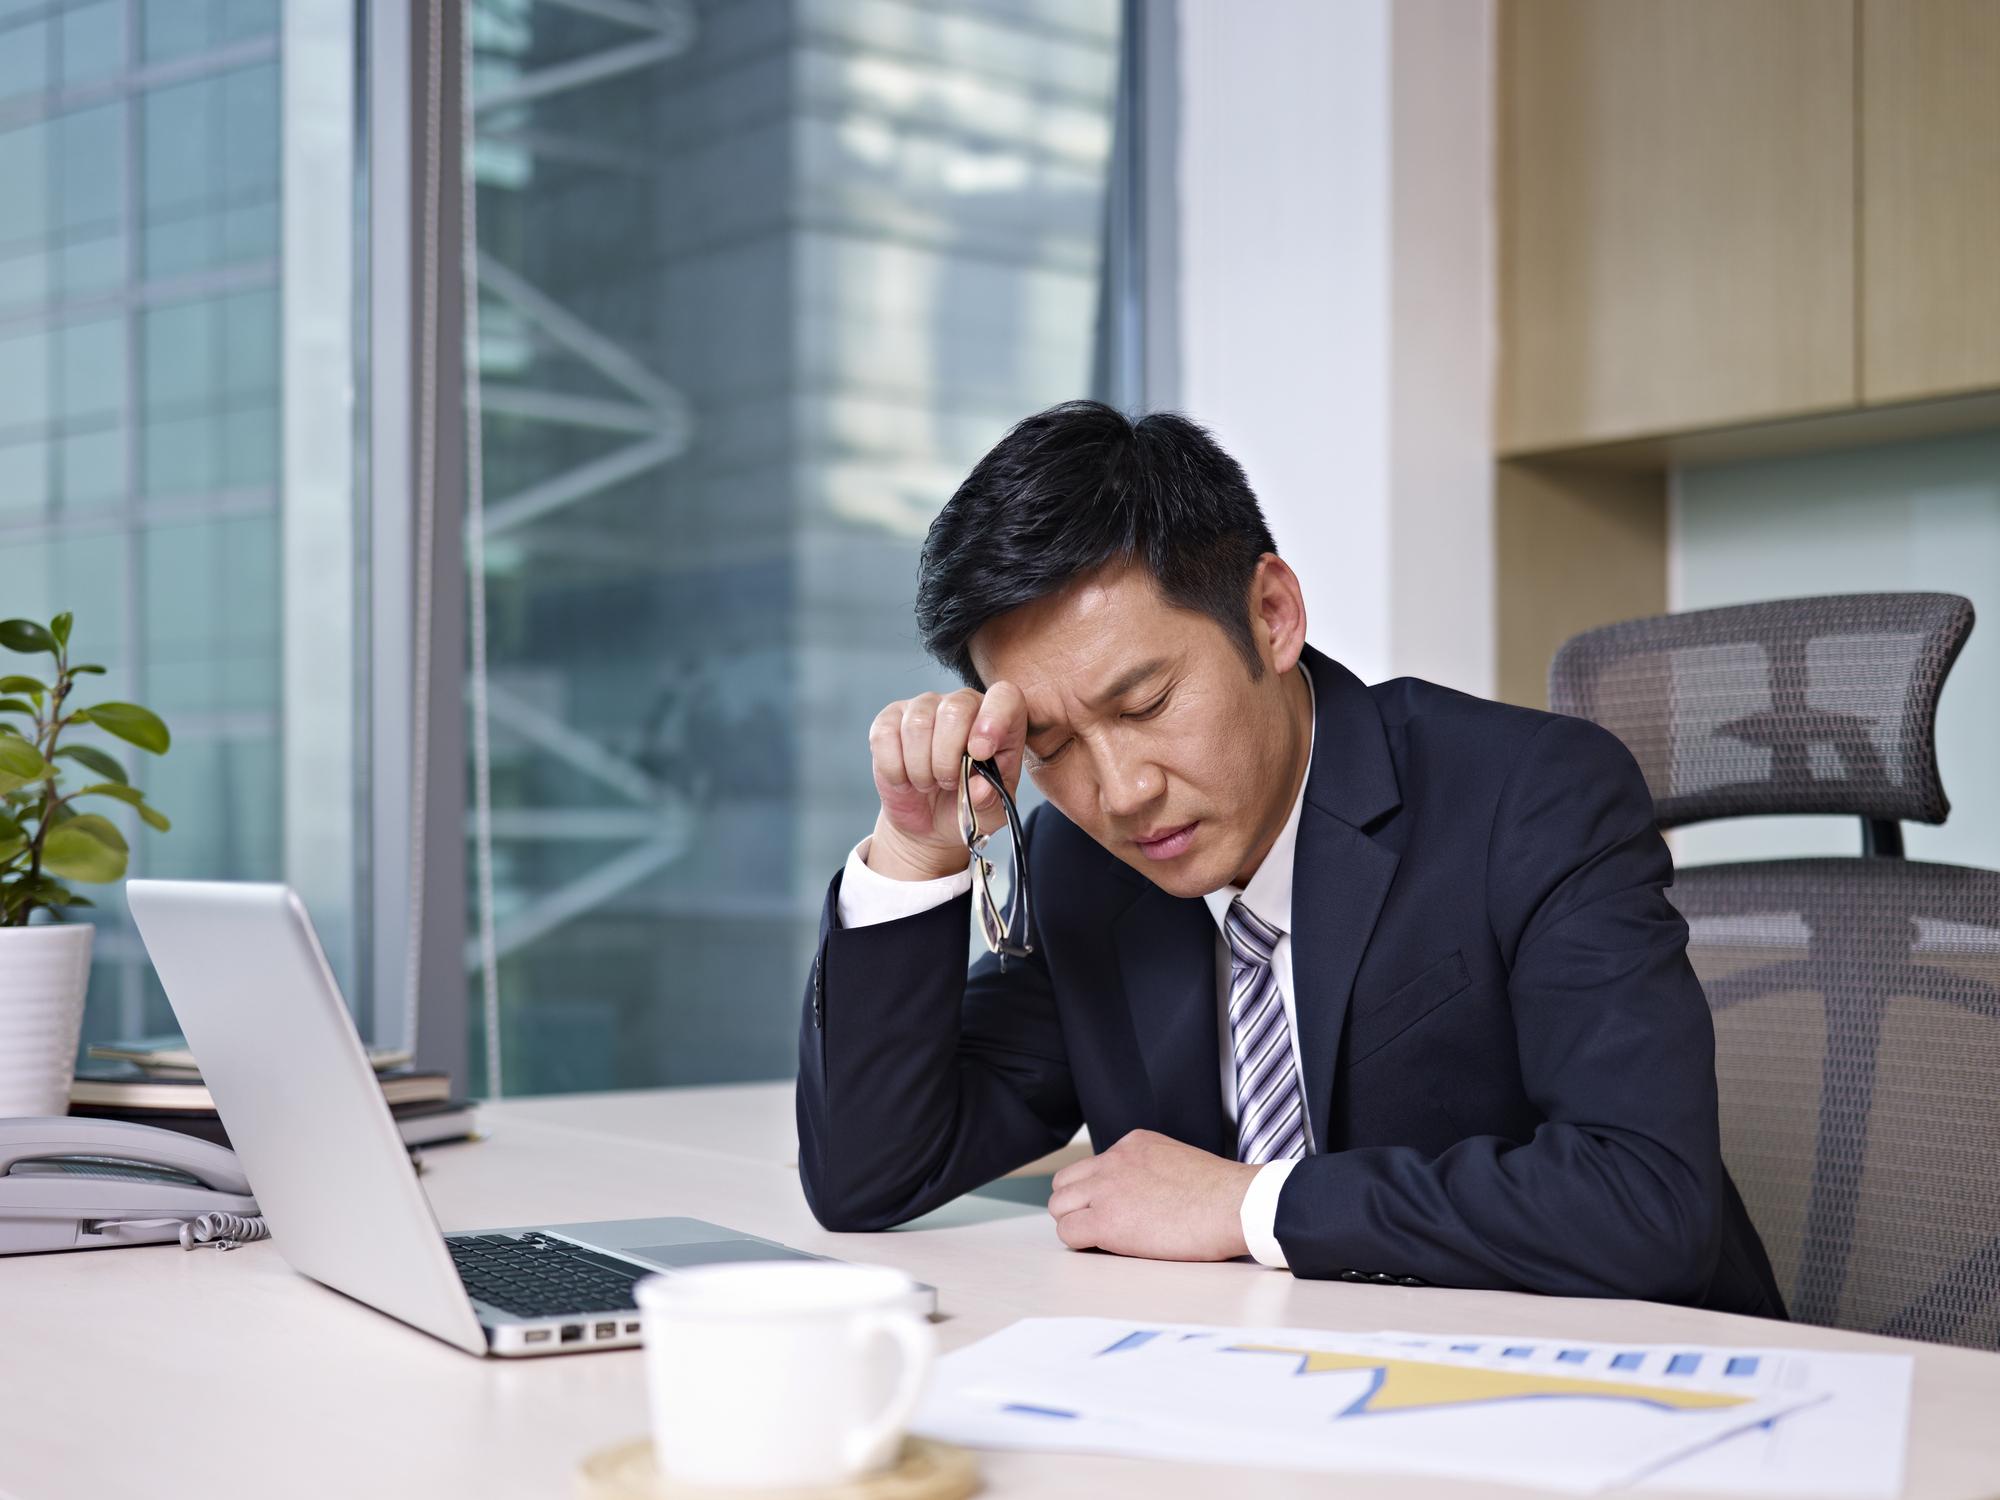 Businessman near computer thinking hard.